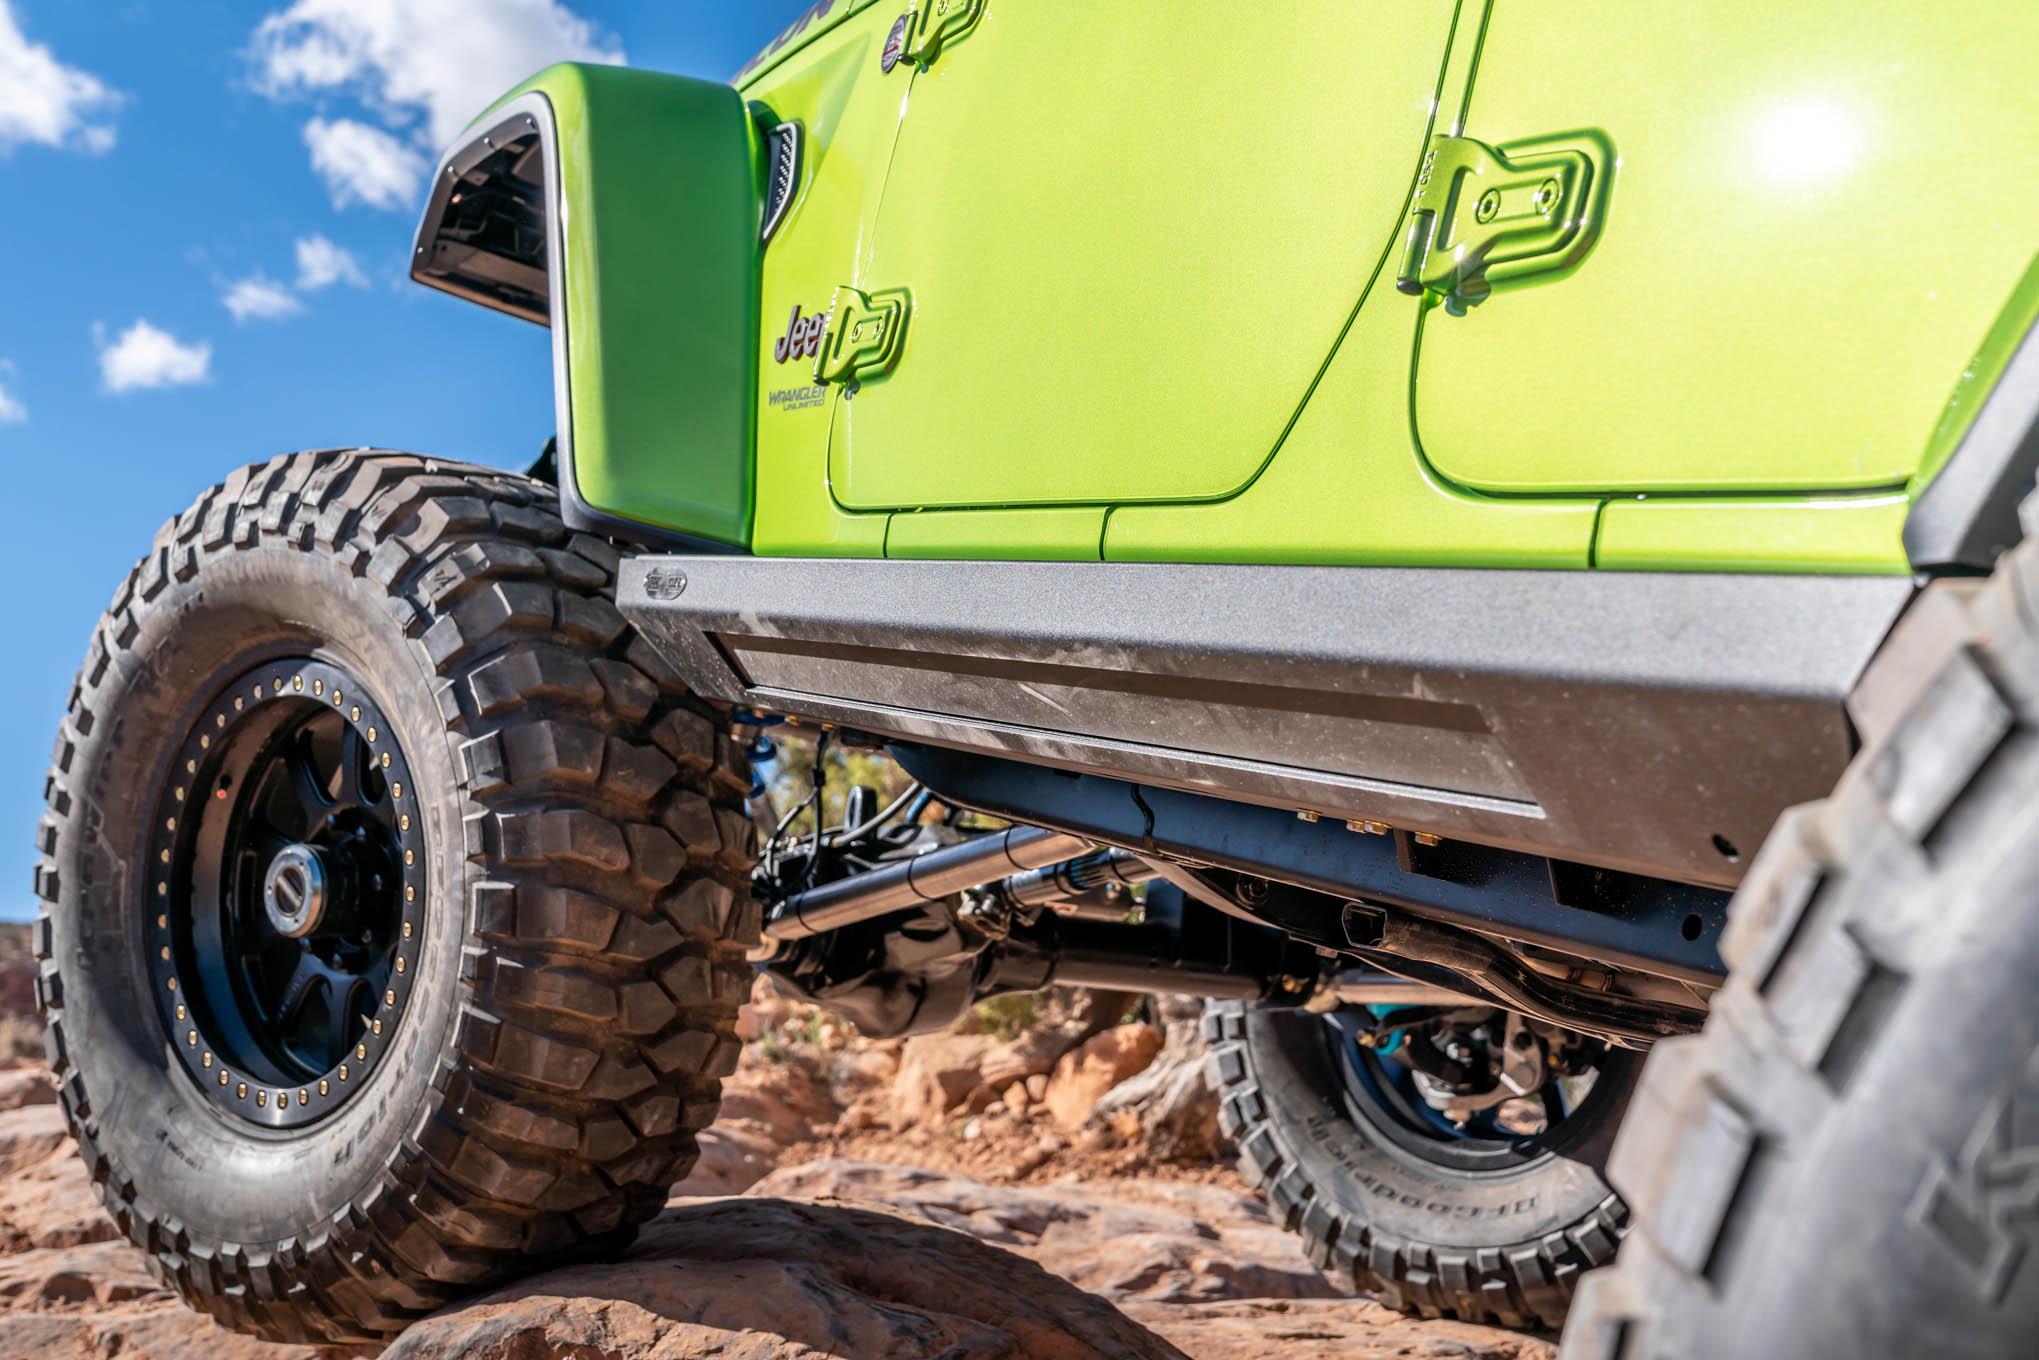 0026 2018 jeep wrangler unlimited rubicon dynatrac prorock 42 dixie 4 wheel drive